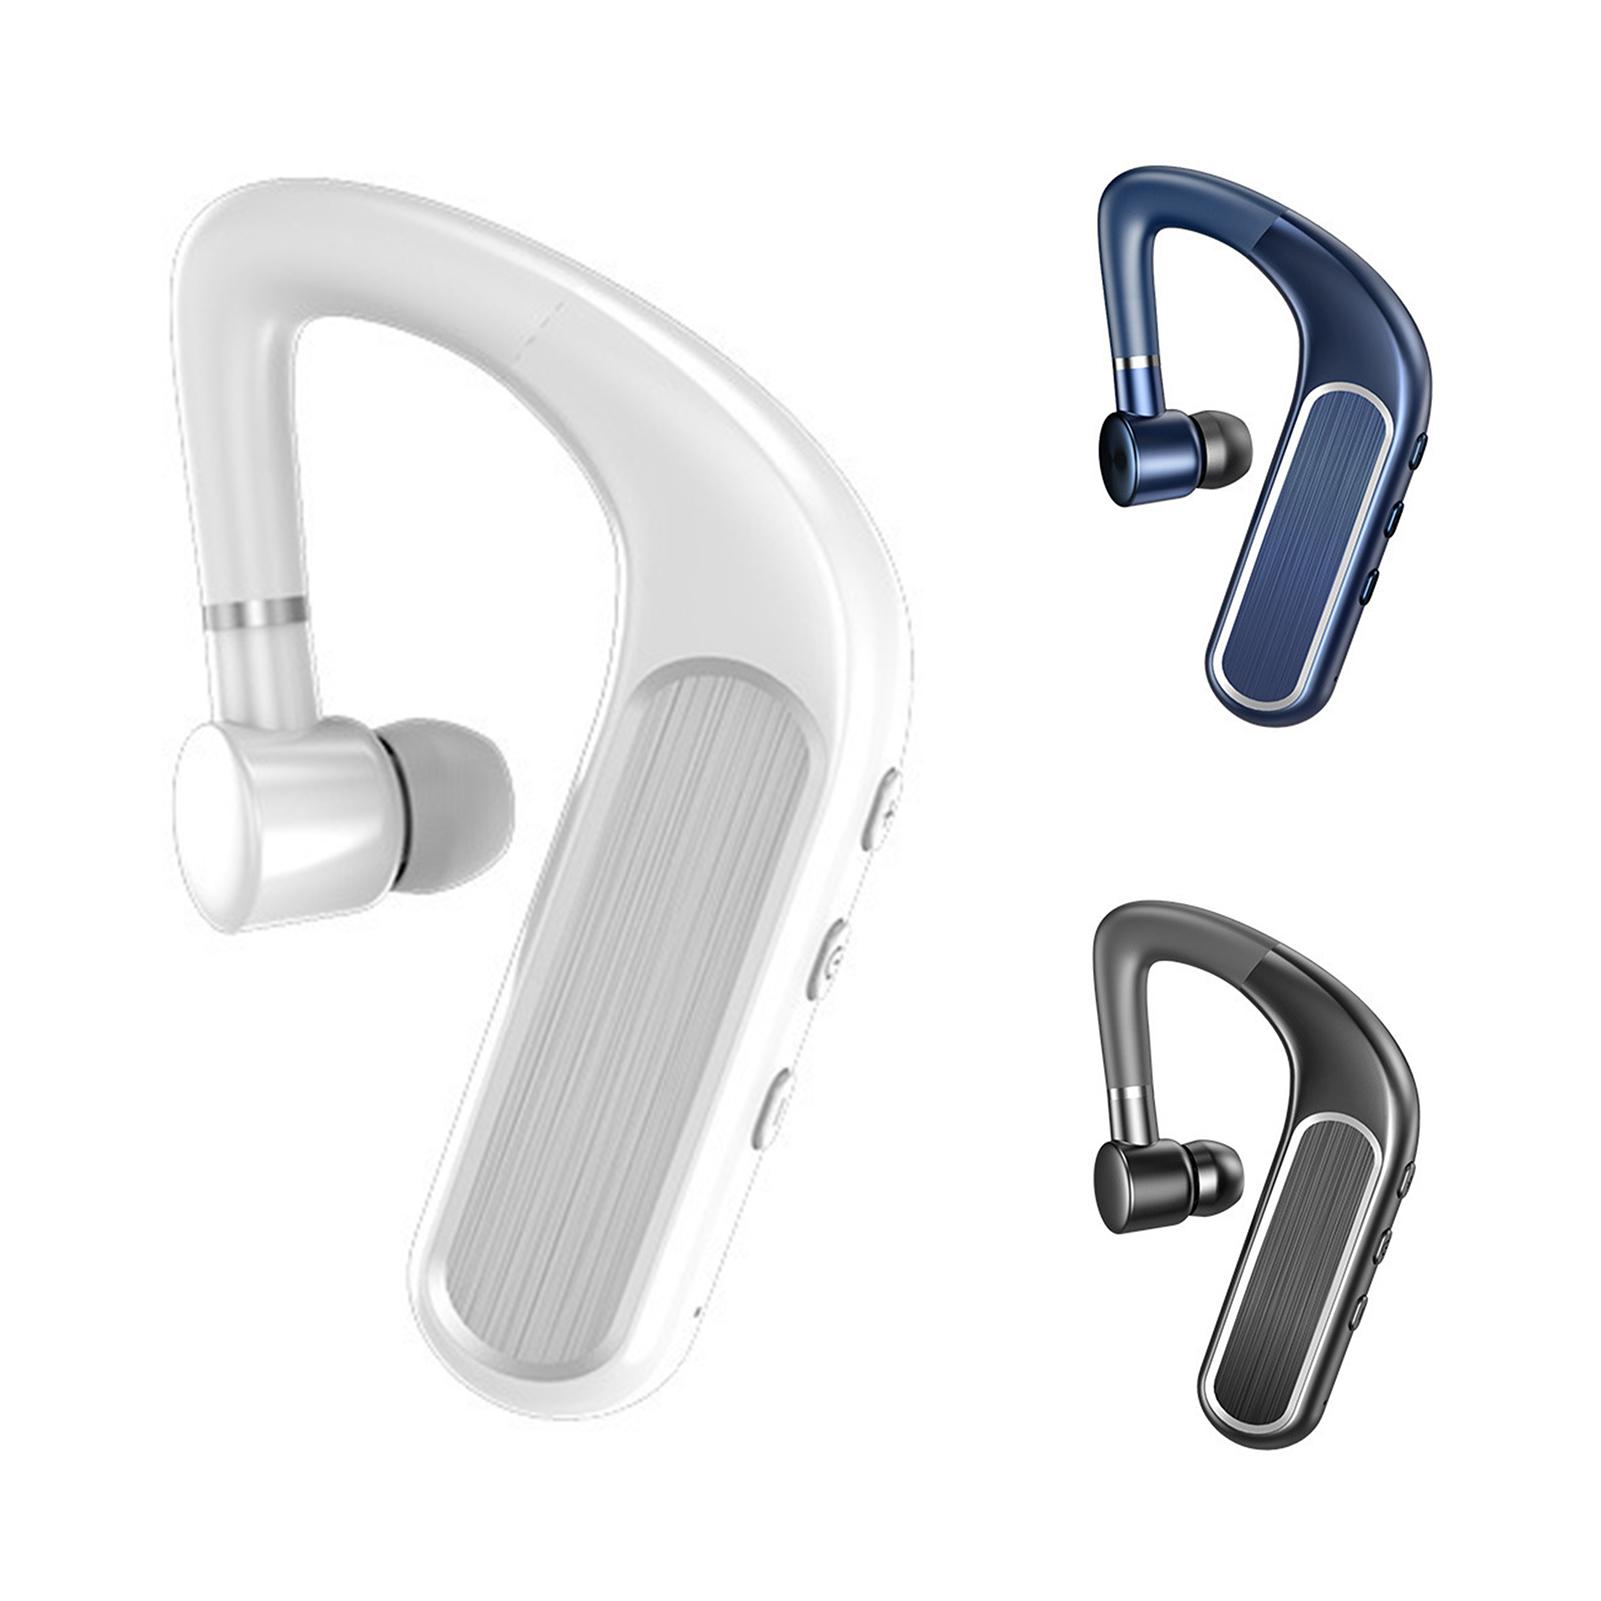 Bluetooth 5.0-Headset WanILY Drahtloses Headset kompatibel mit ...